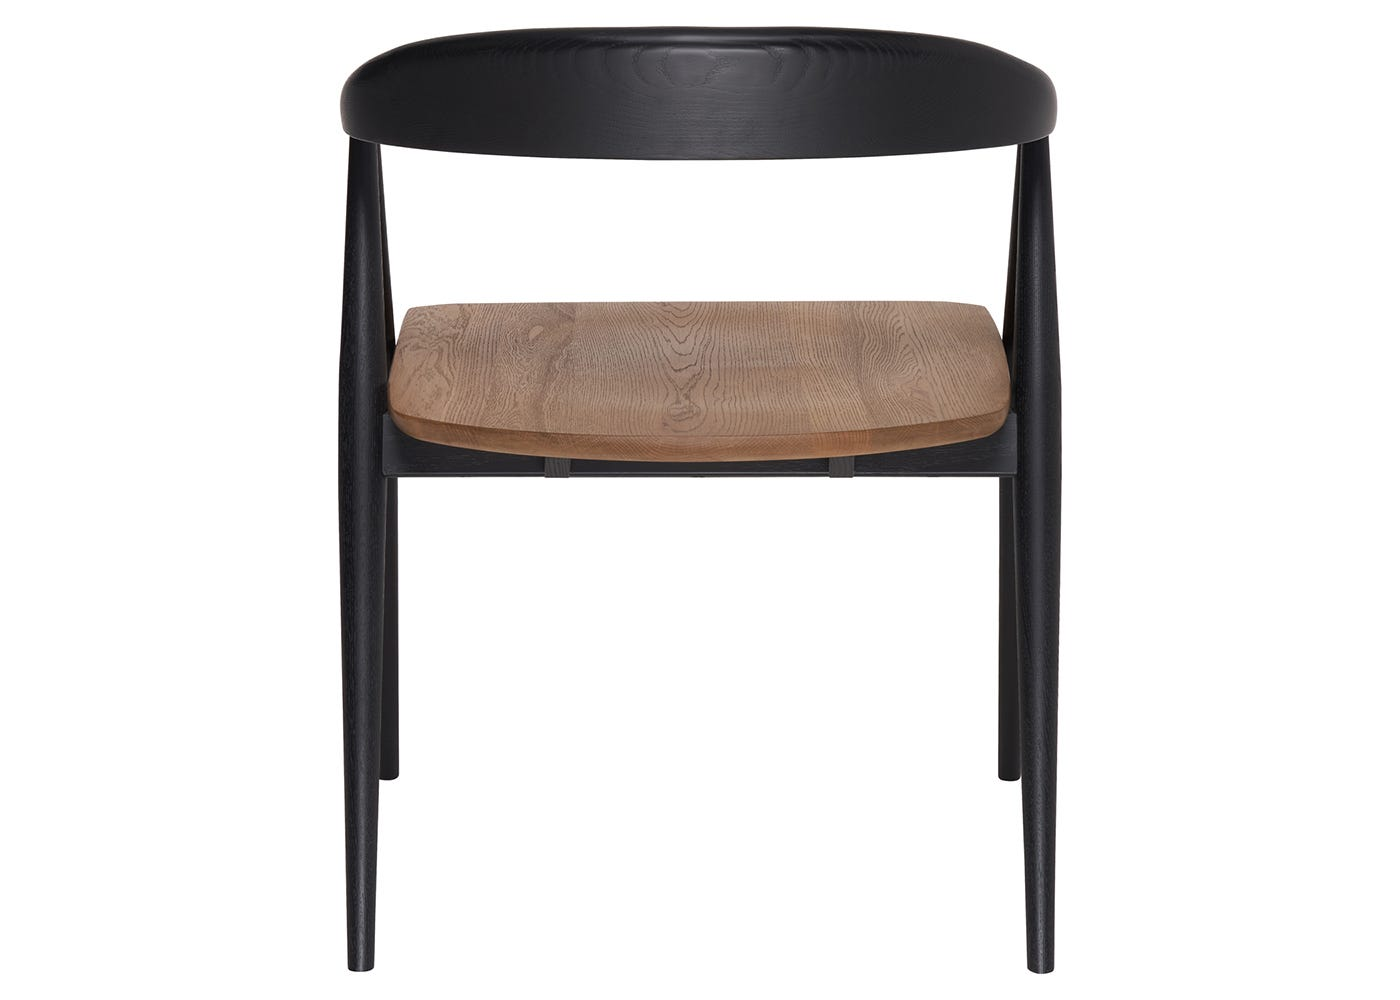 Monza Dining Como Chair - Rear View